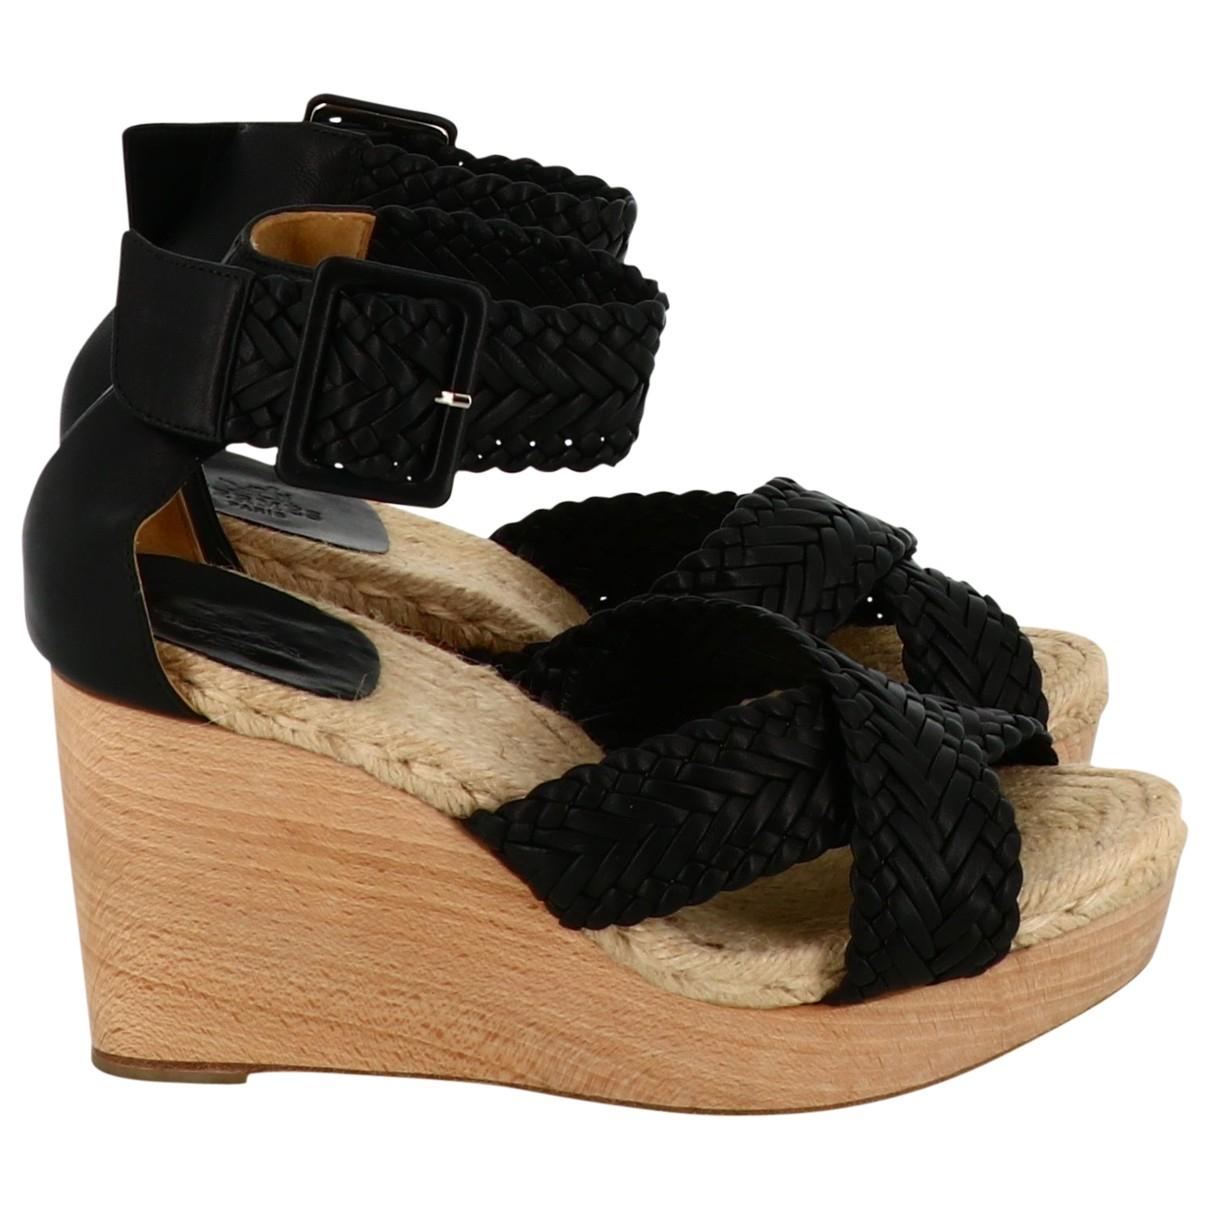 Hermès \N Black Leather Sandals for Women 38.5 EU